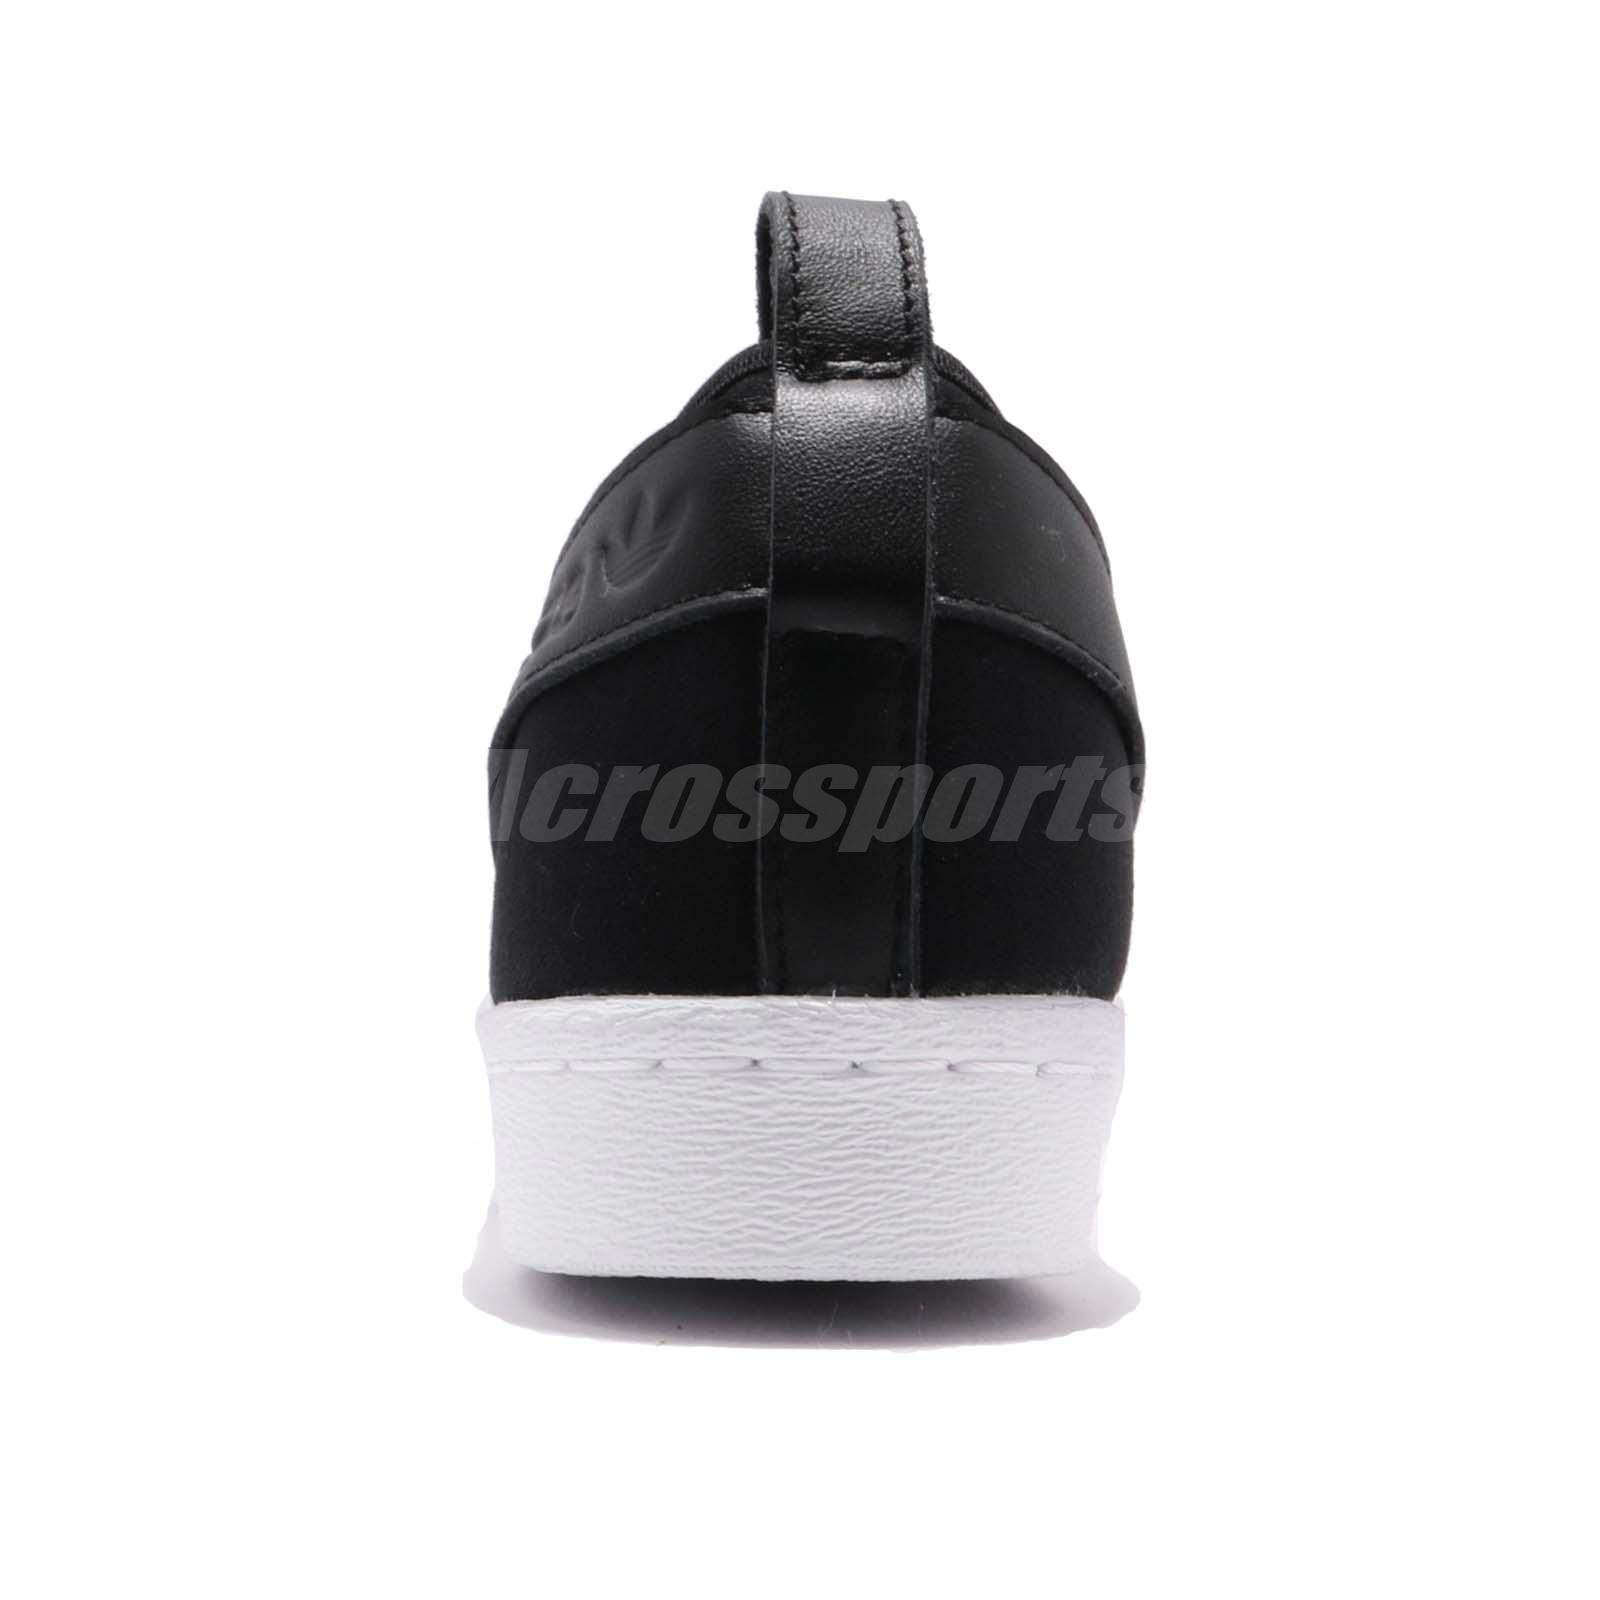 ca4e445a923 ... CORE BLACK CBLACK FOOTWEAR WHITE. Made In  Indonesia. Condition  Brand  New With Box